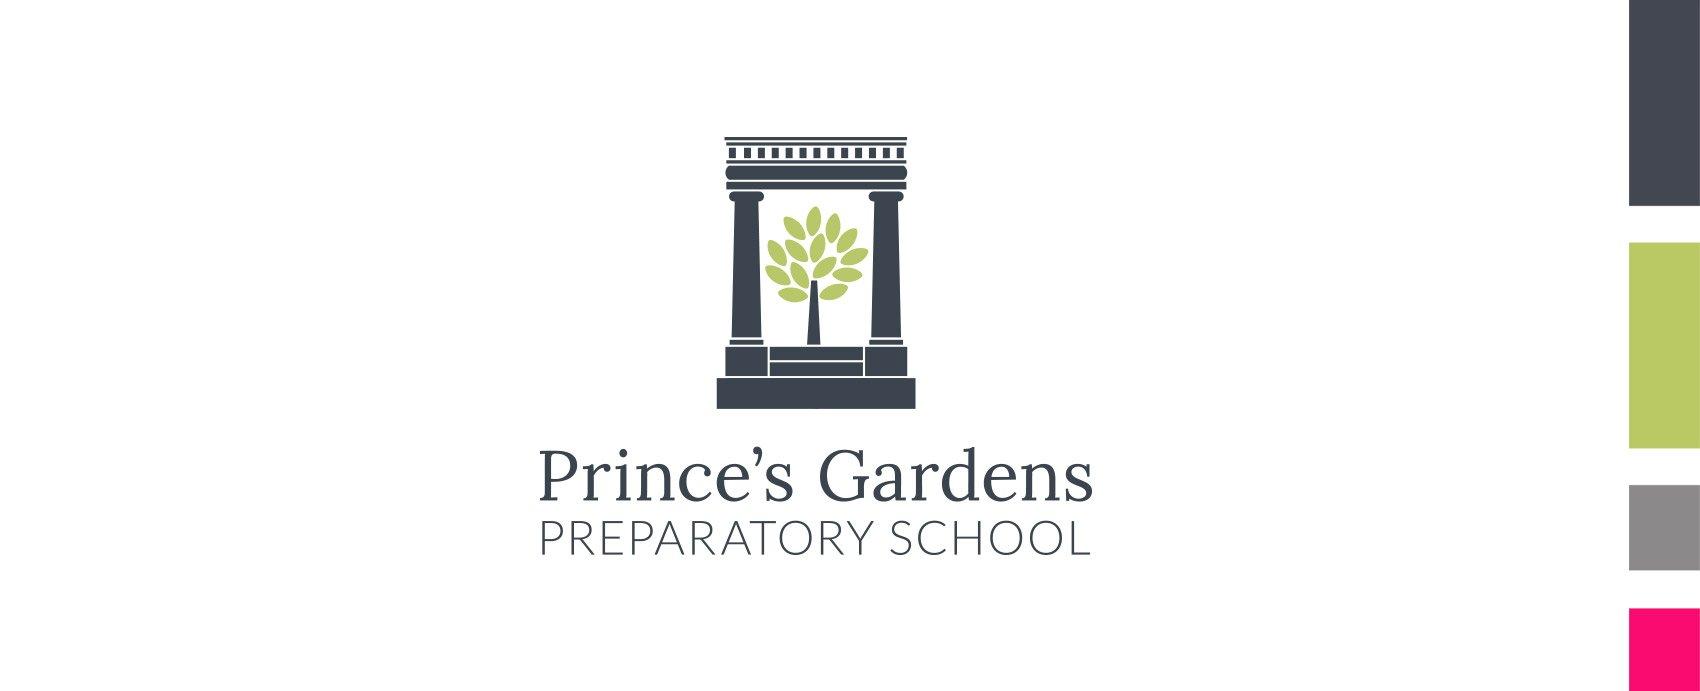 Princes Garden Prep Lockup vertical